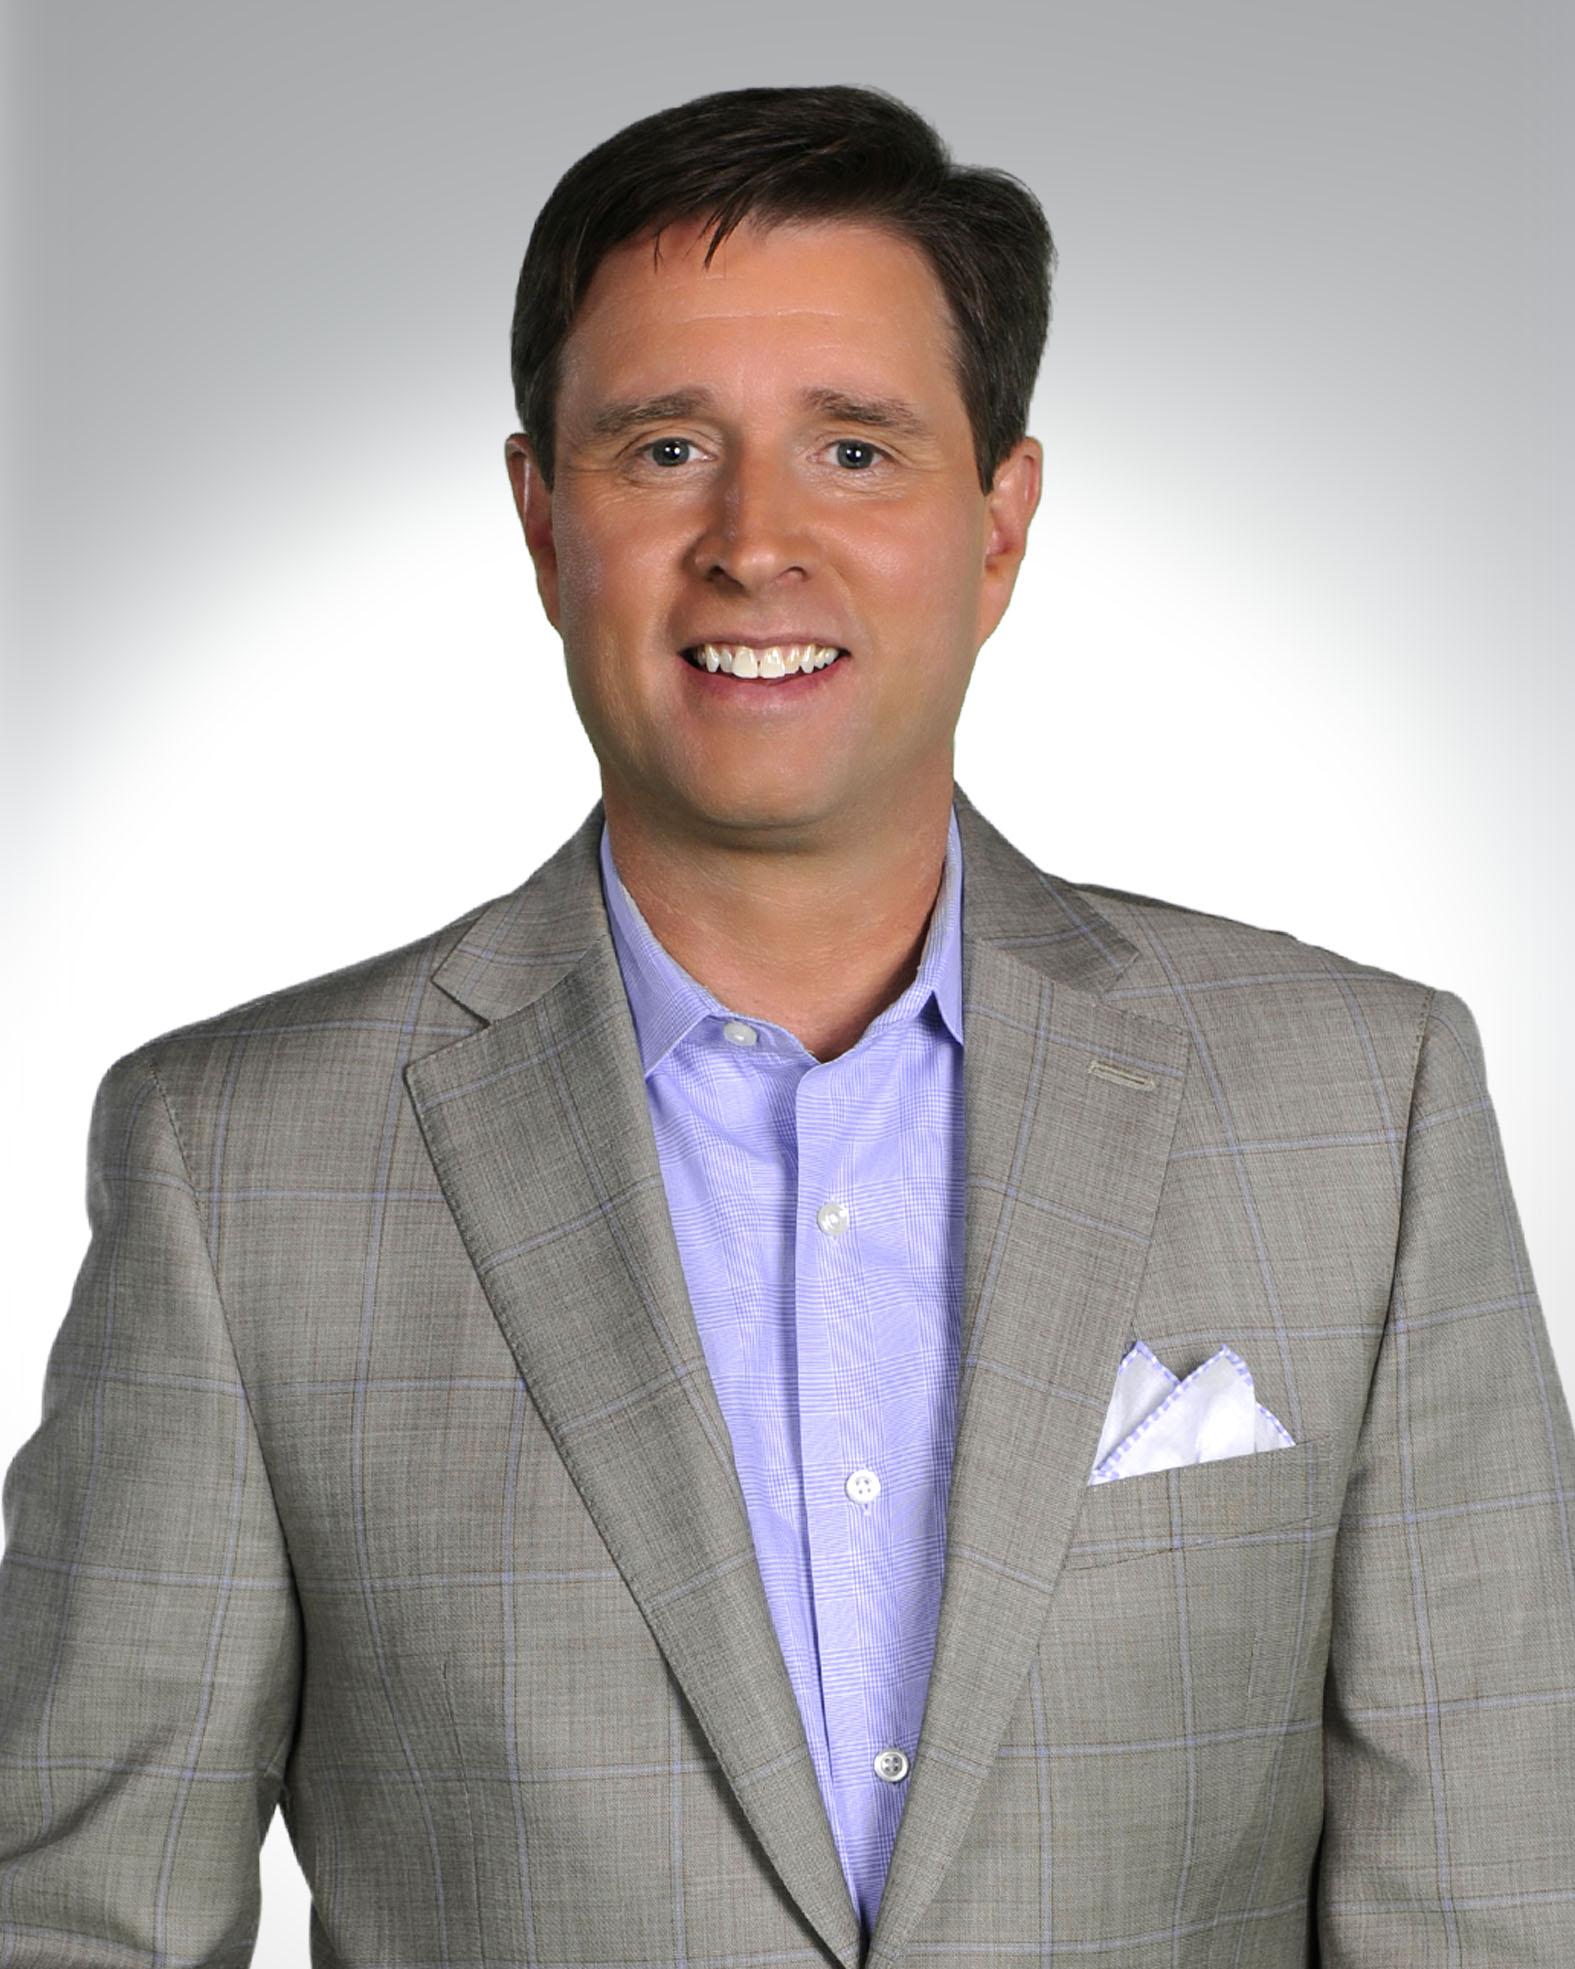 GARY WILLIAMS | NBC Sports Pressbox